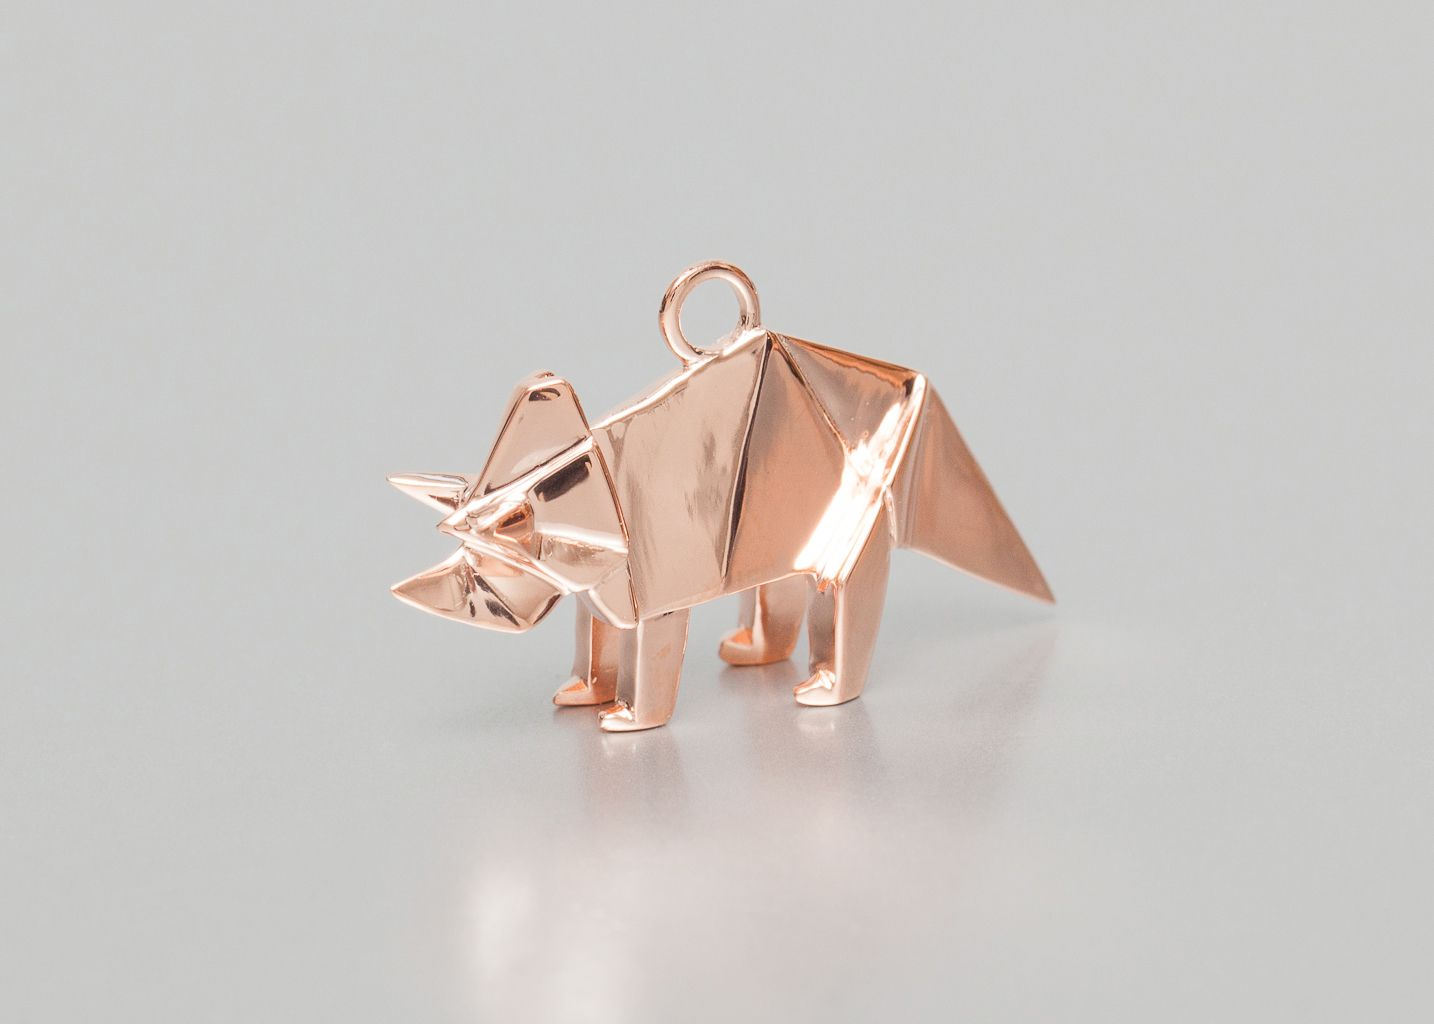 Sautoir Rhinocéros Origami - Origami Jewellery